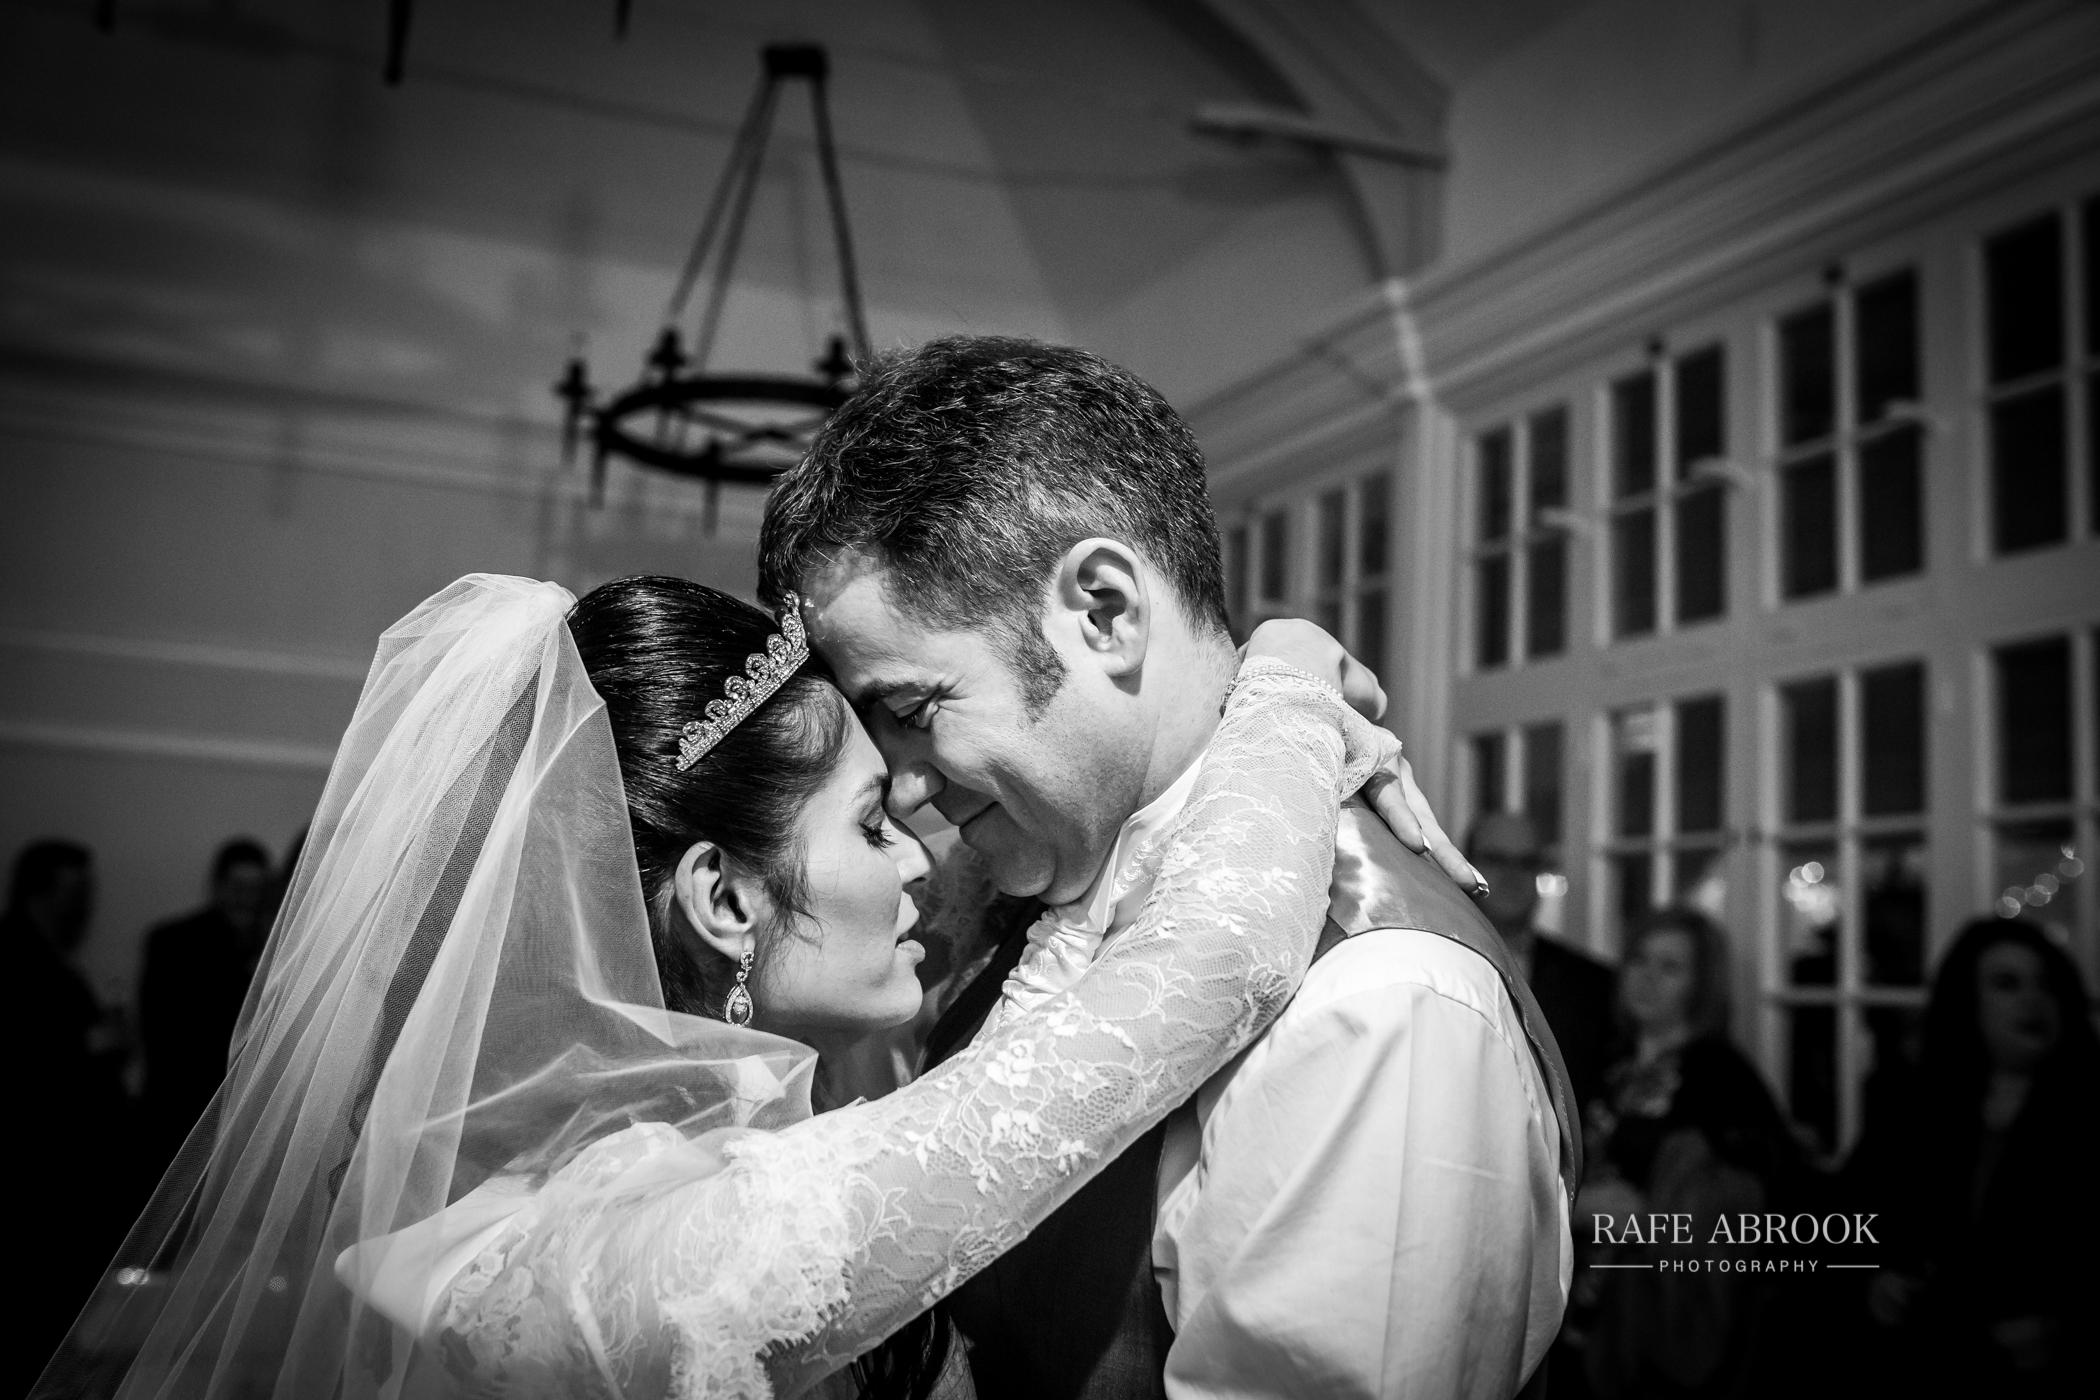 roma & pete wedding hampstead shenley hertfordshire -484.jpg